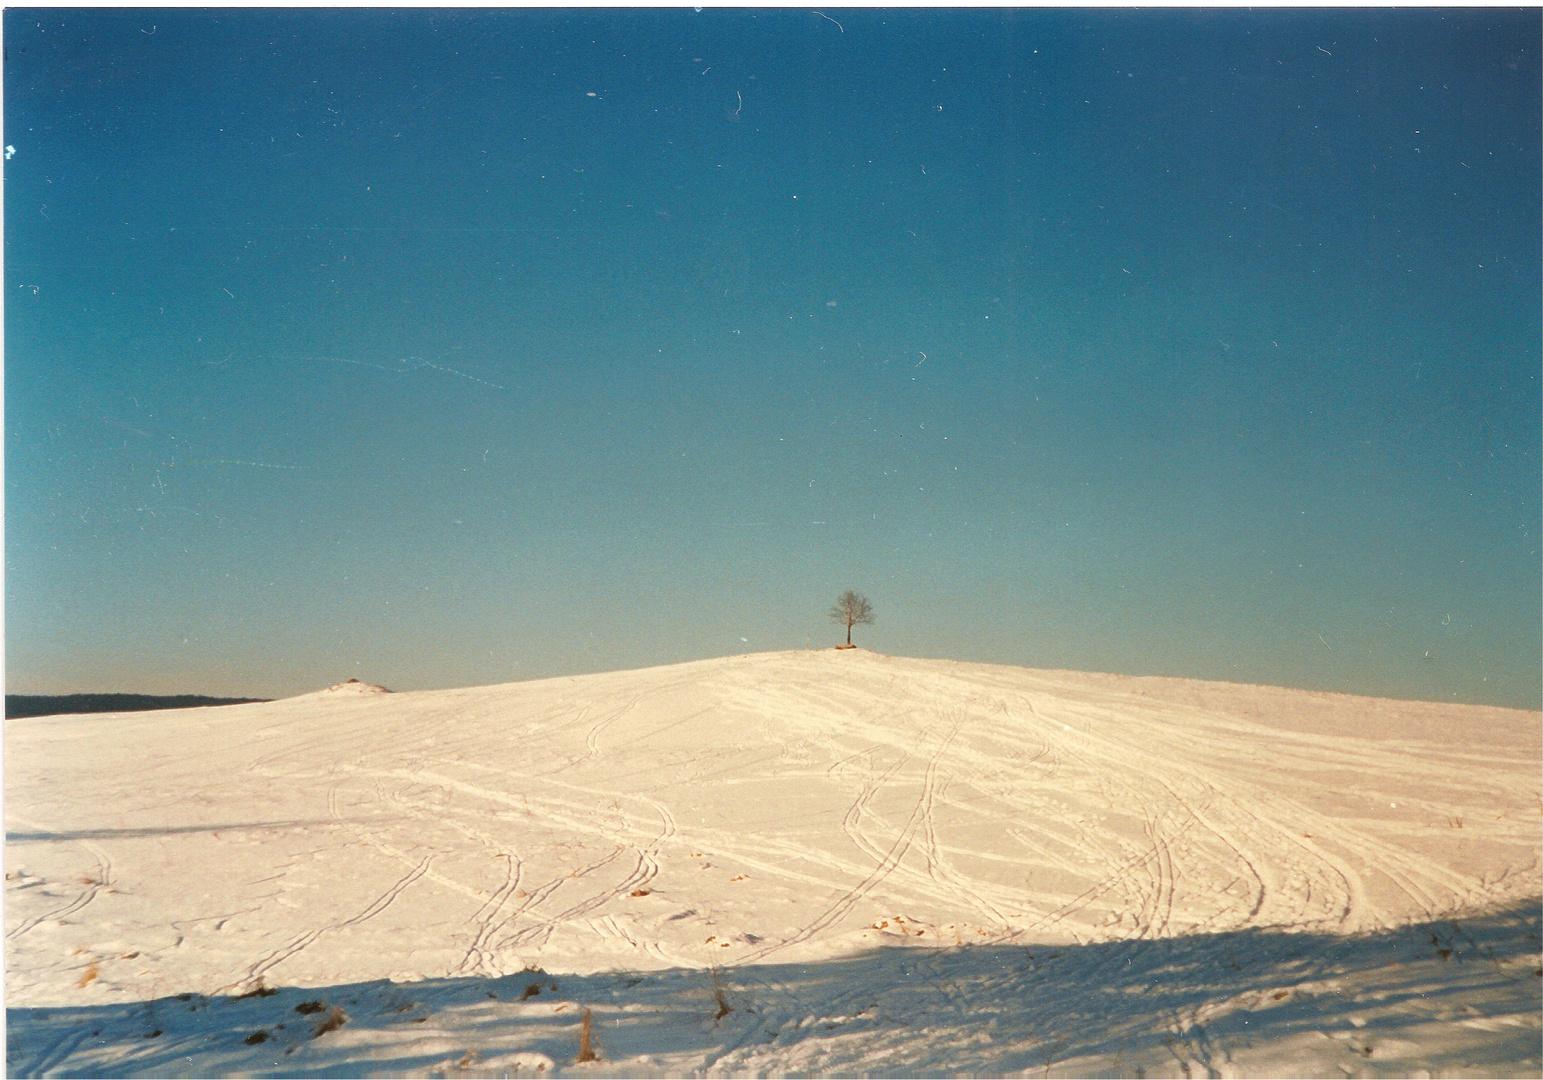 Winter time in Krusne hory